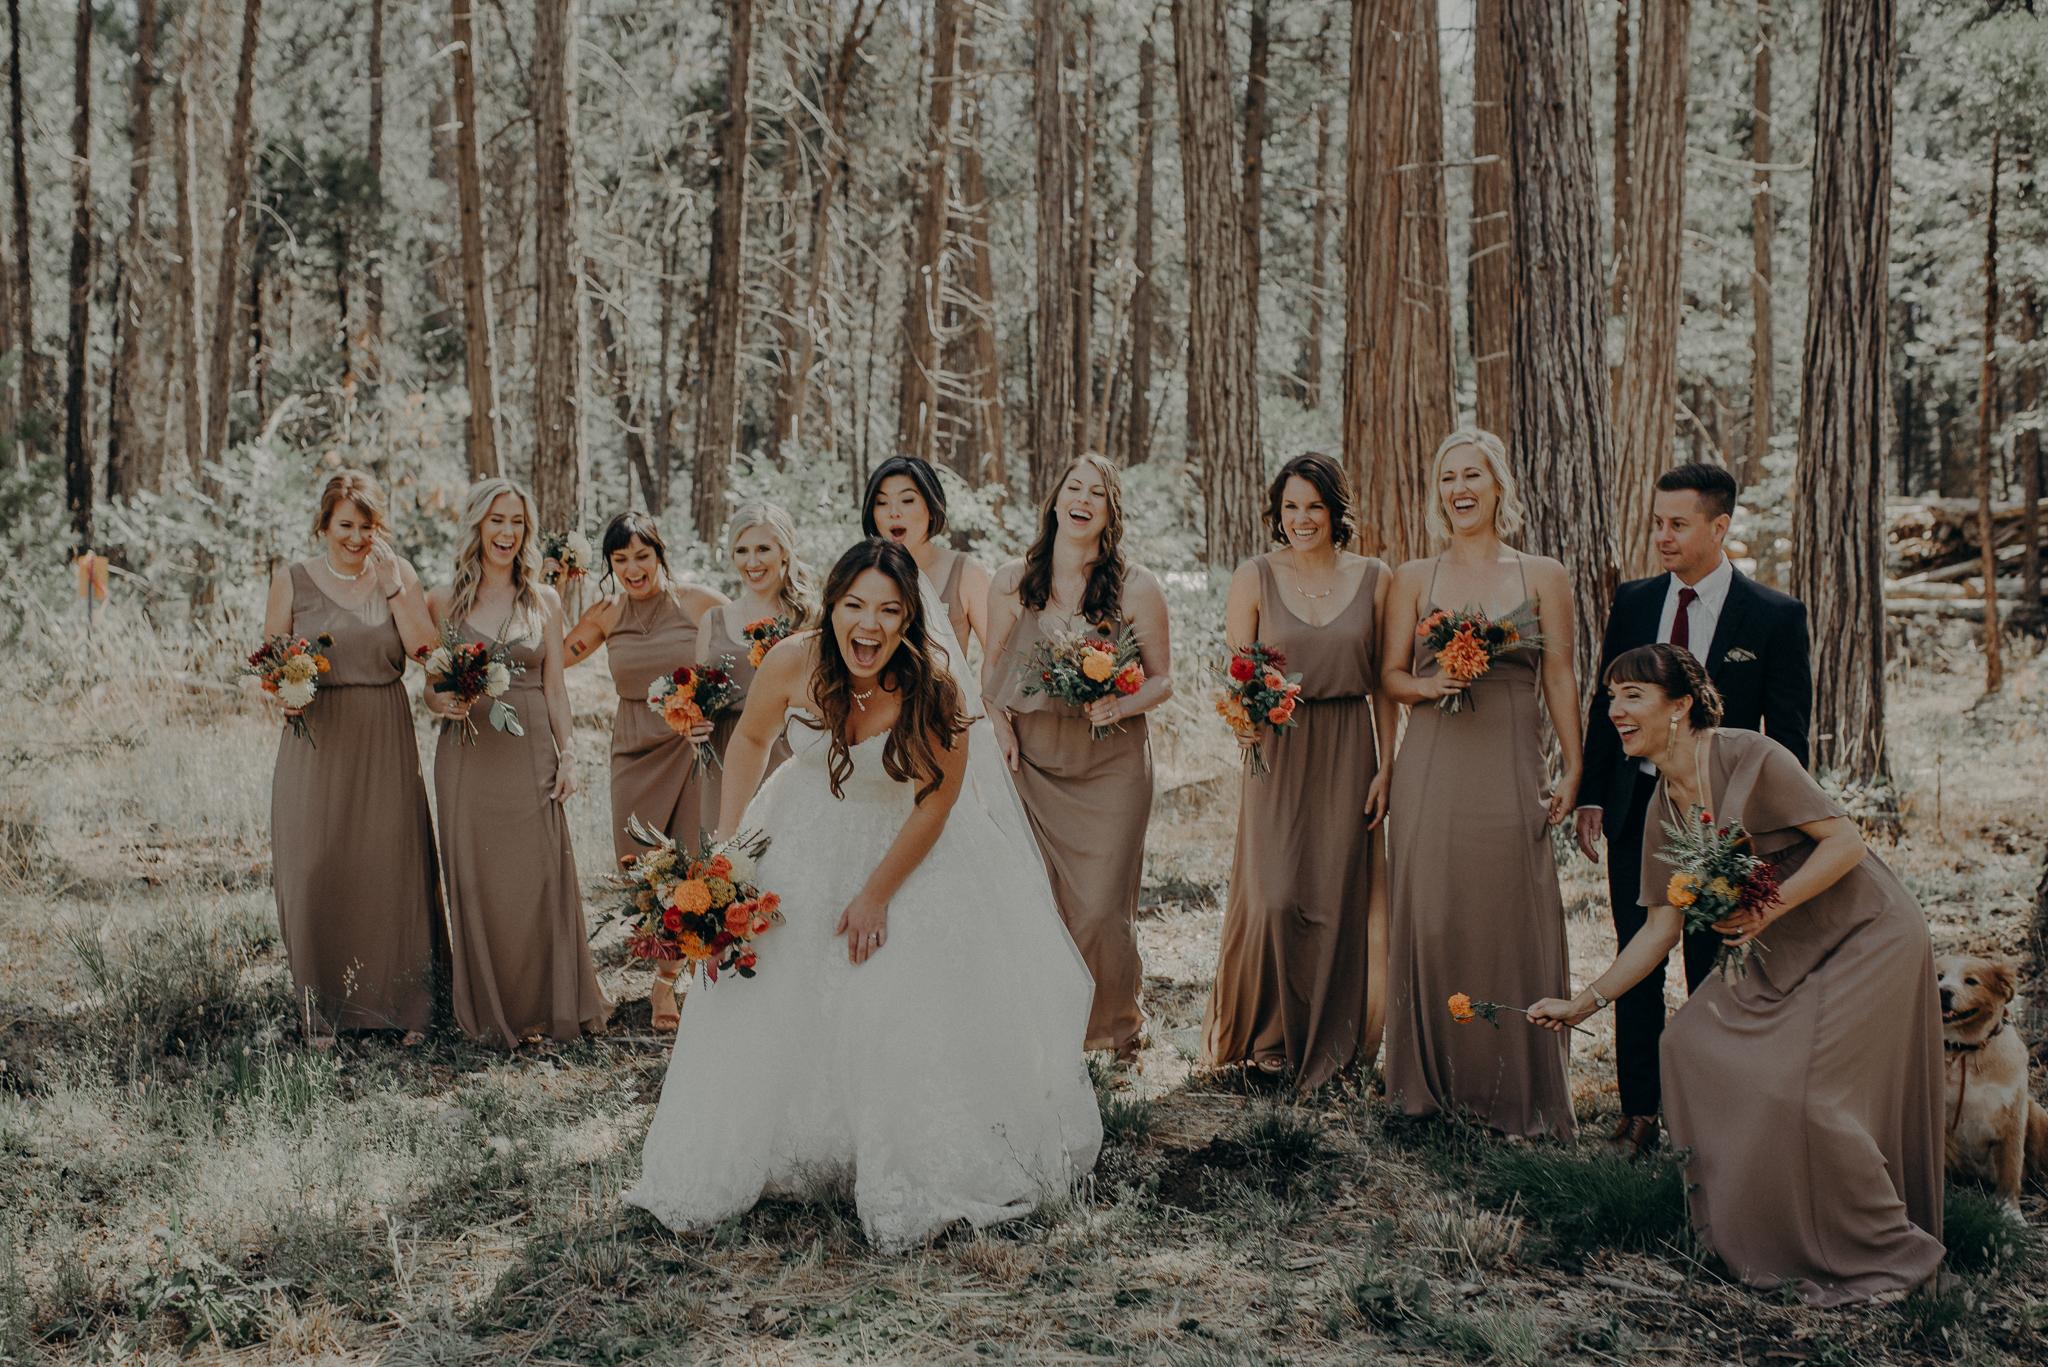 Yosemite Elopement Photographer - Evergreen Lodge Wedding Photographer - IsaiahAndTaylor.com-085.jpg